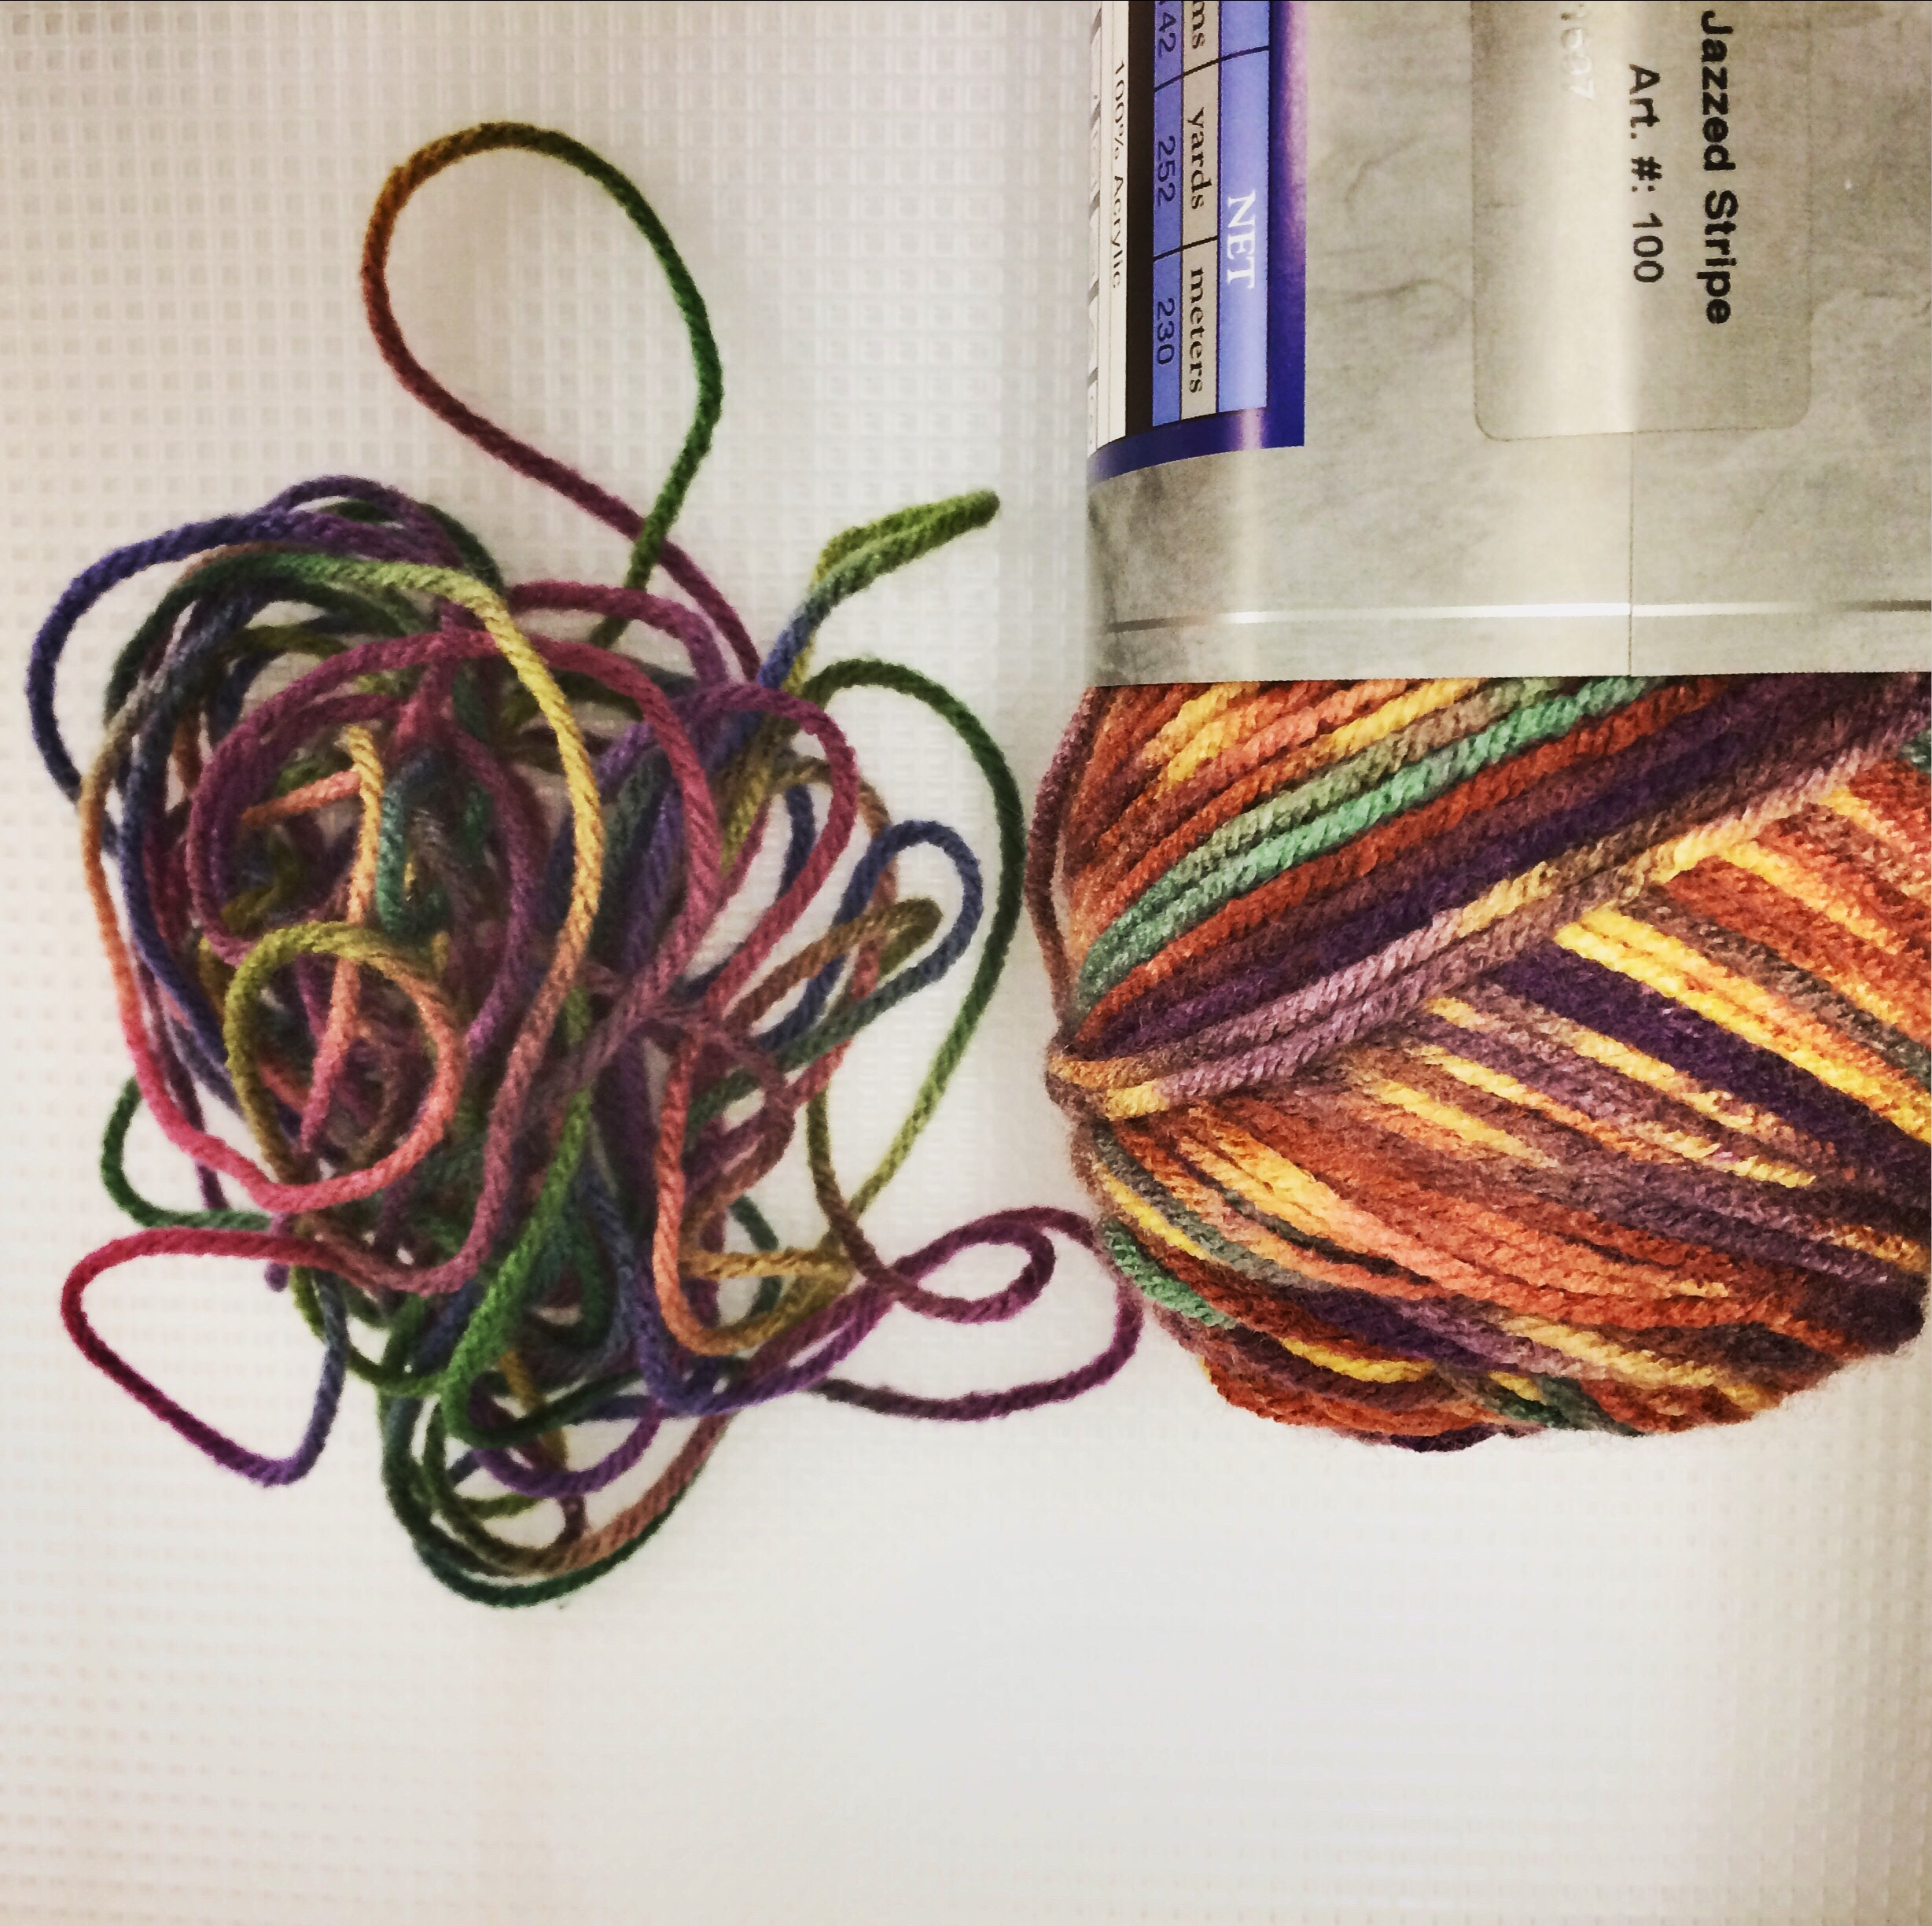 old yarn, new yarn